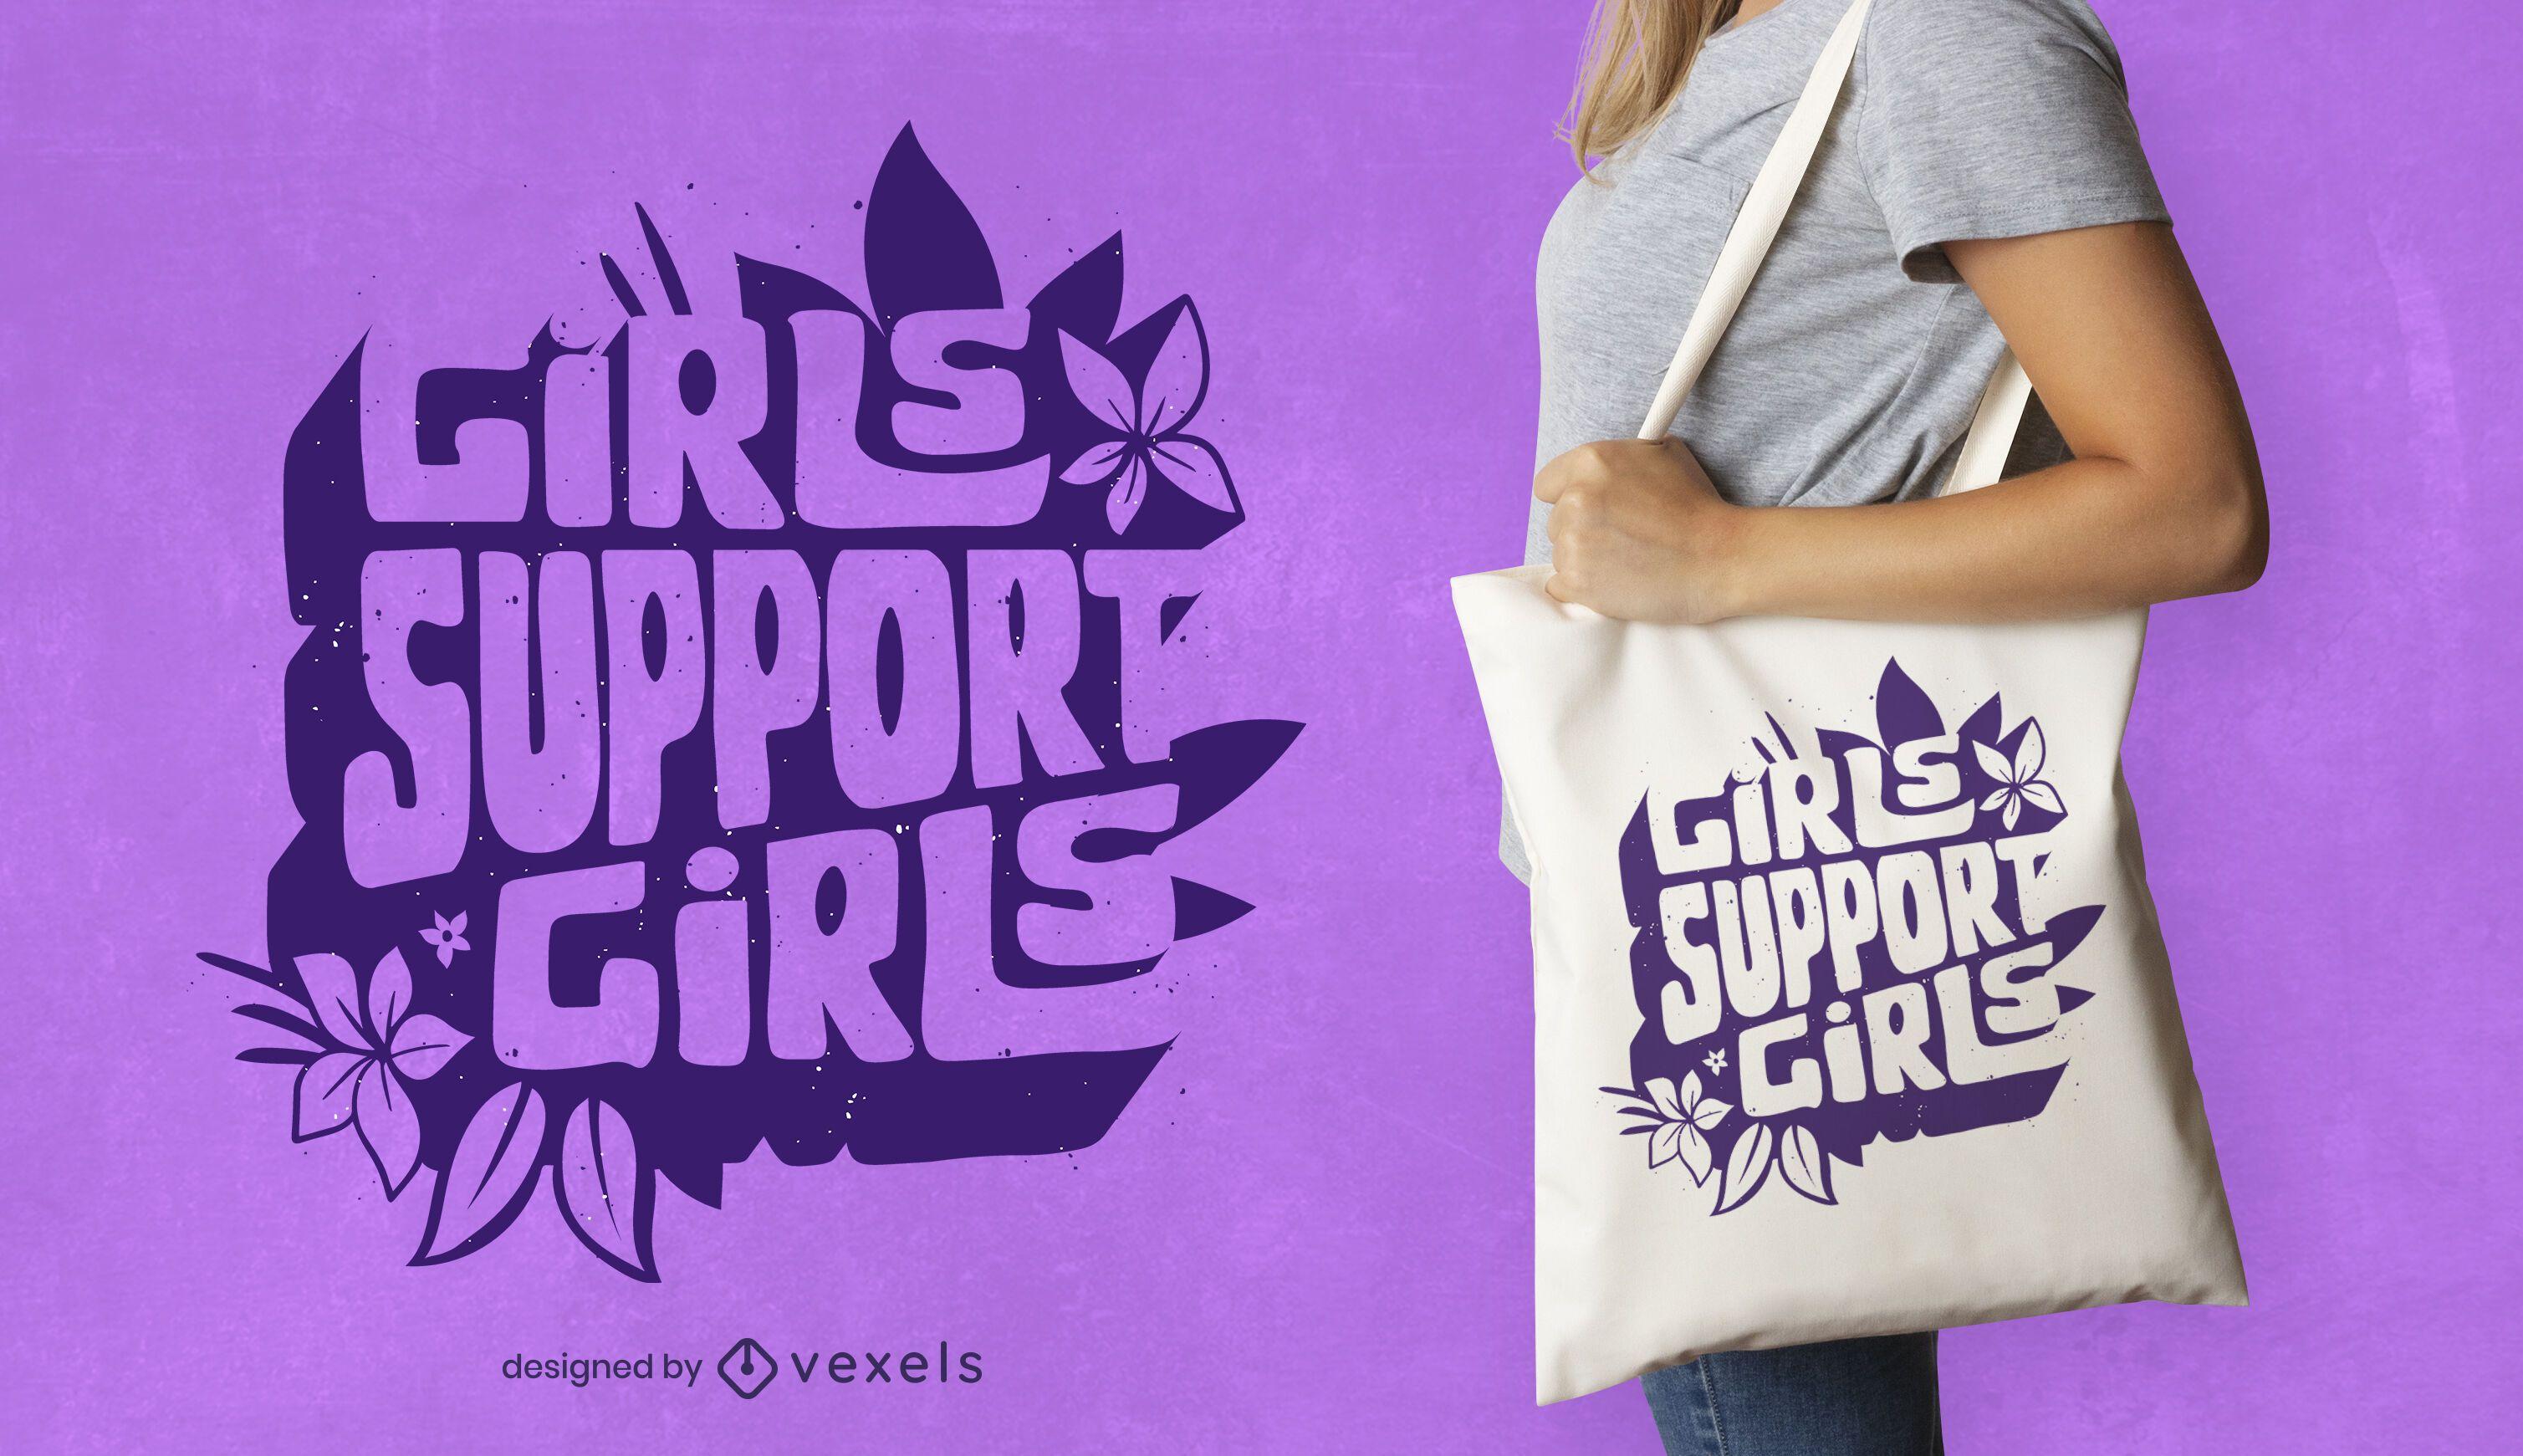 Girls support girls tote bag design